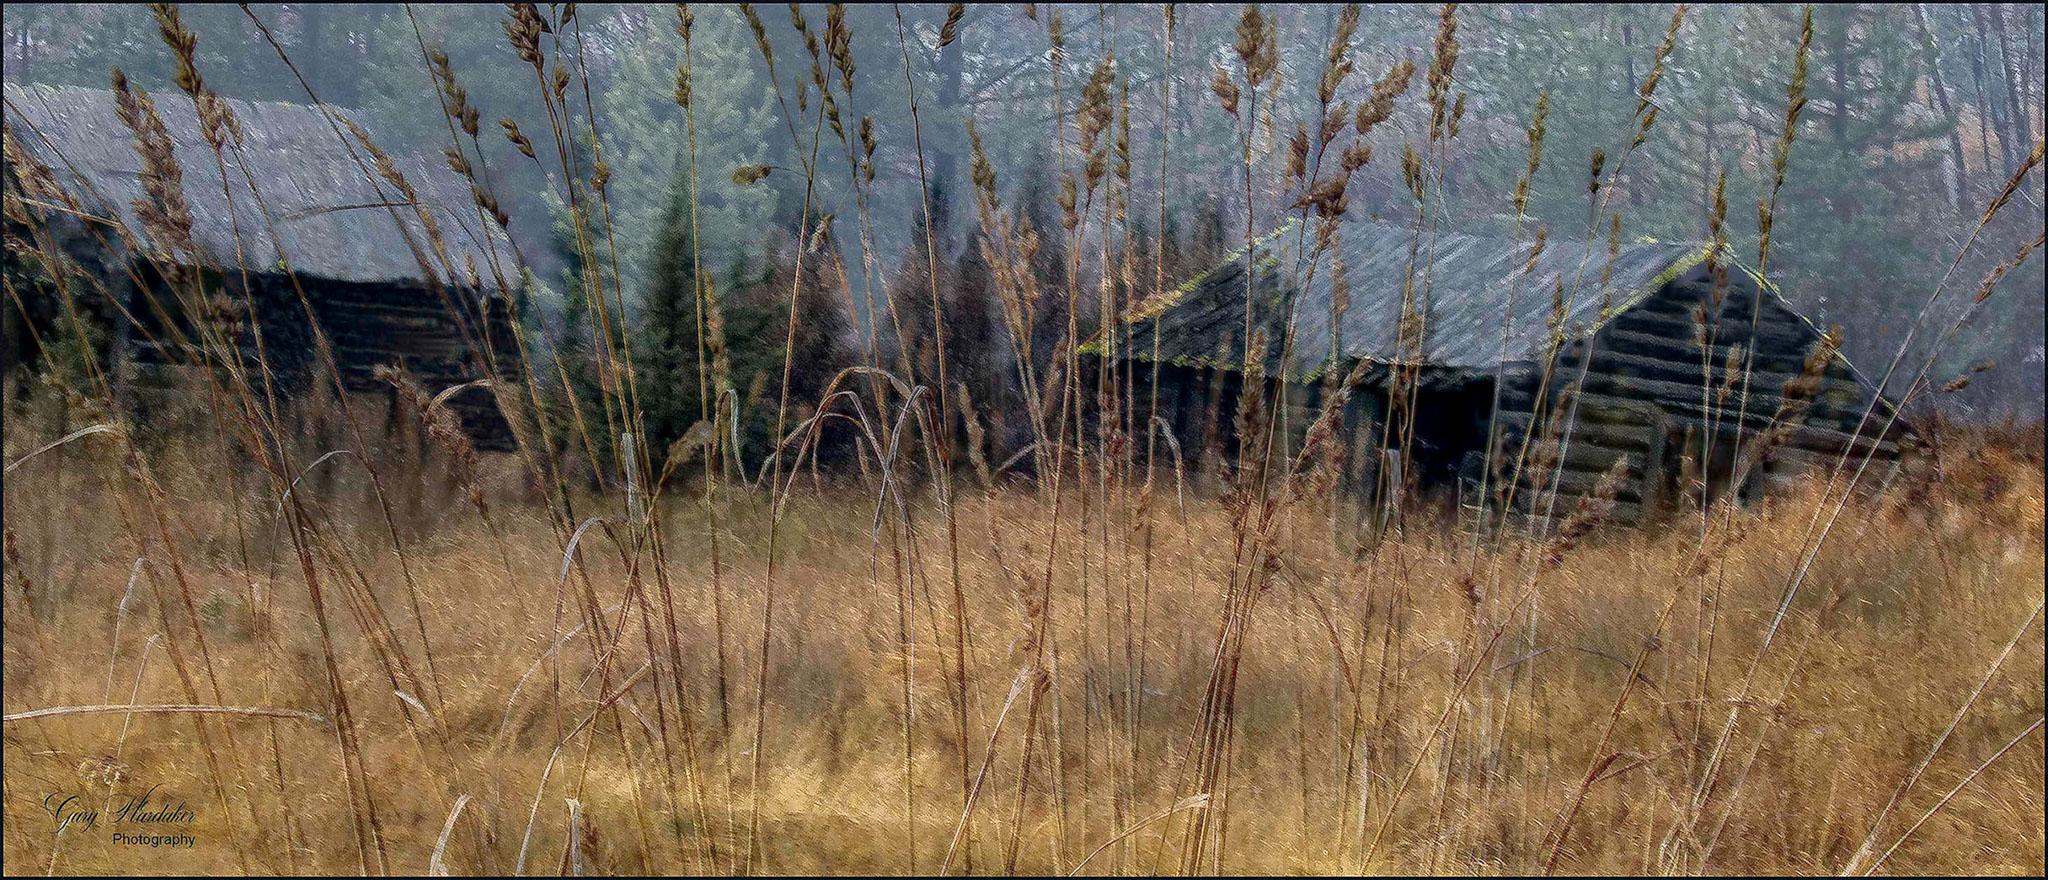 Old Homestead as seen through the Grass- Gary Hardaker